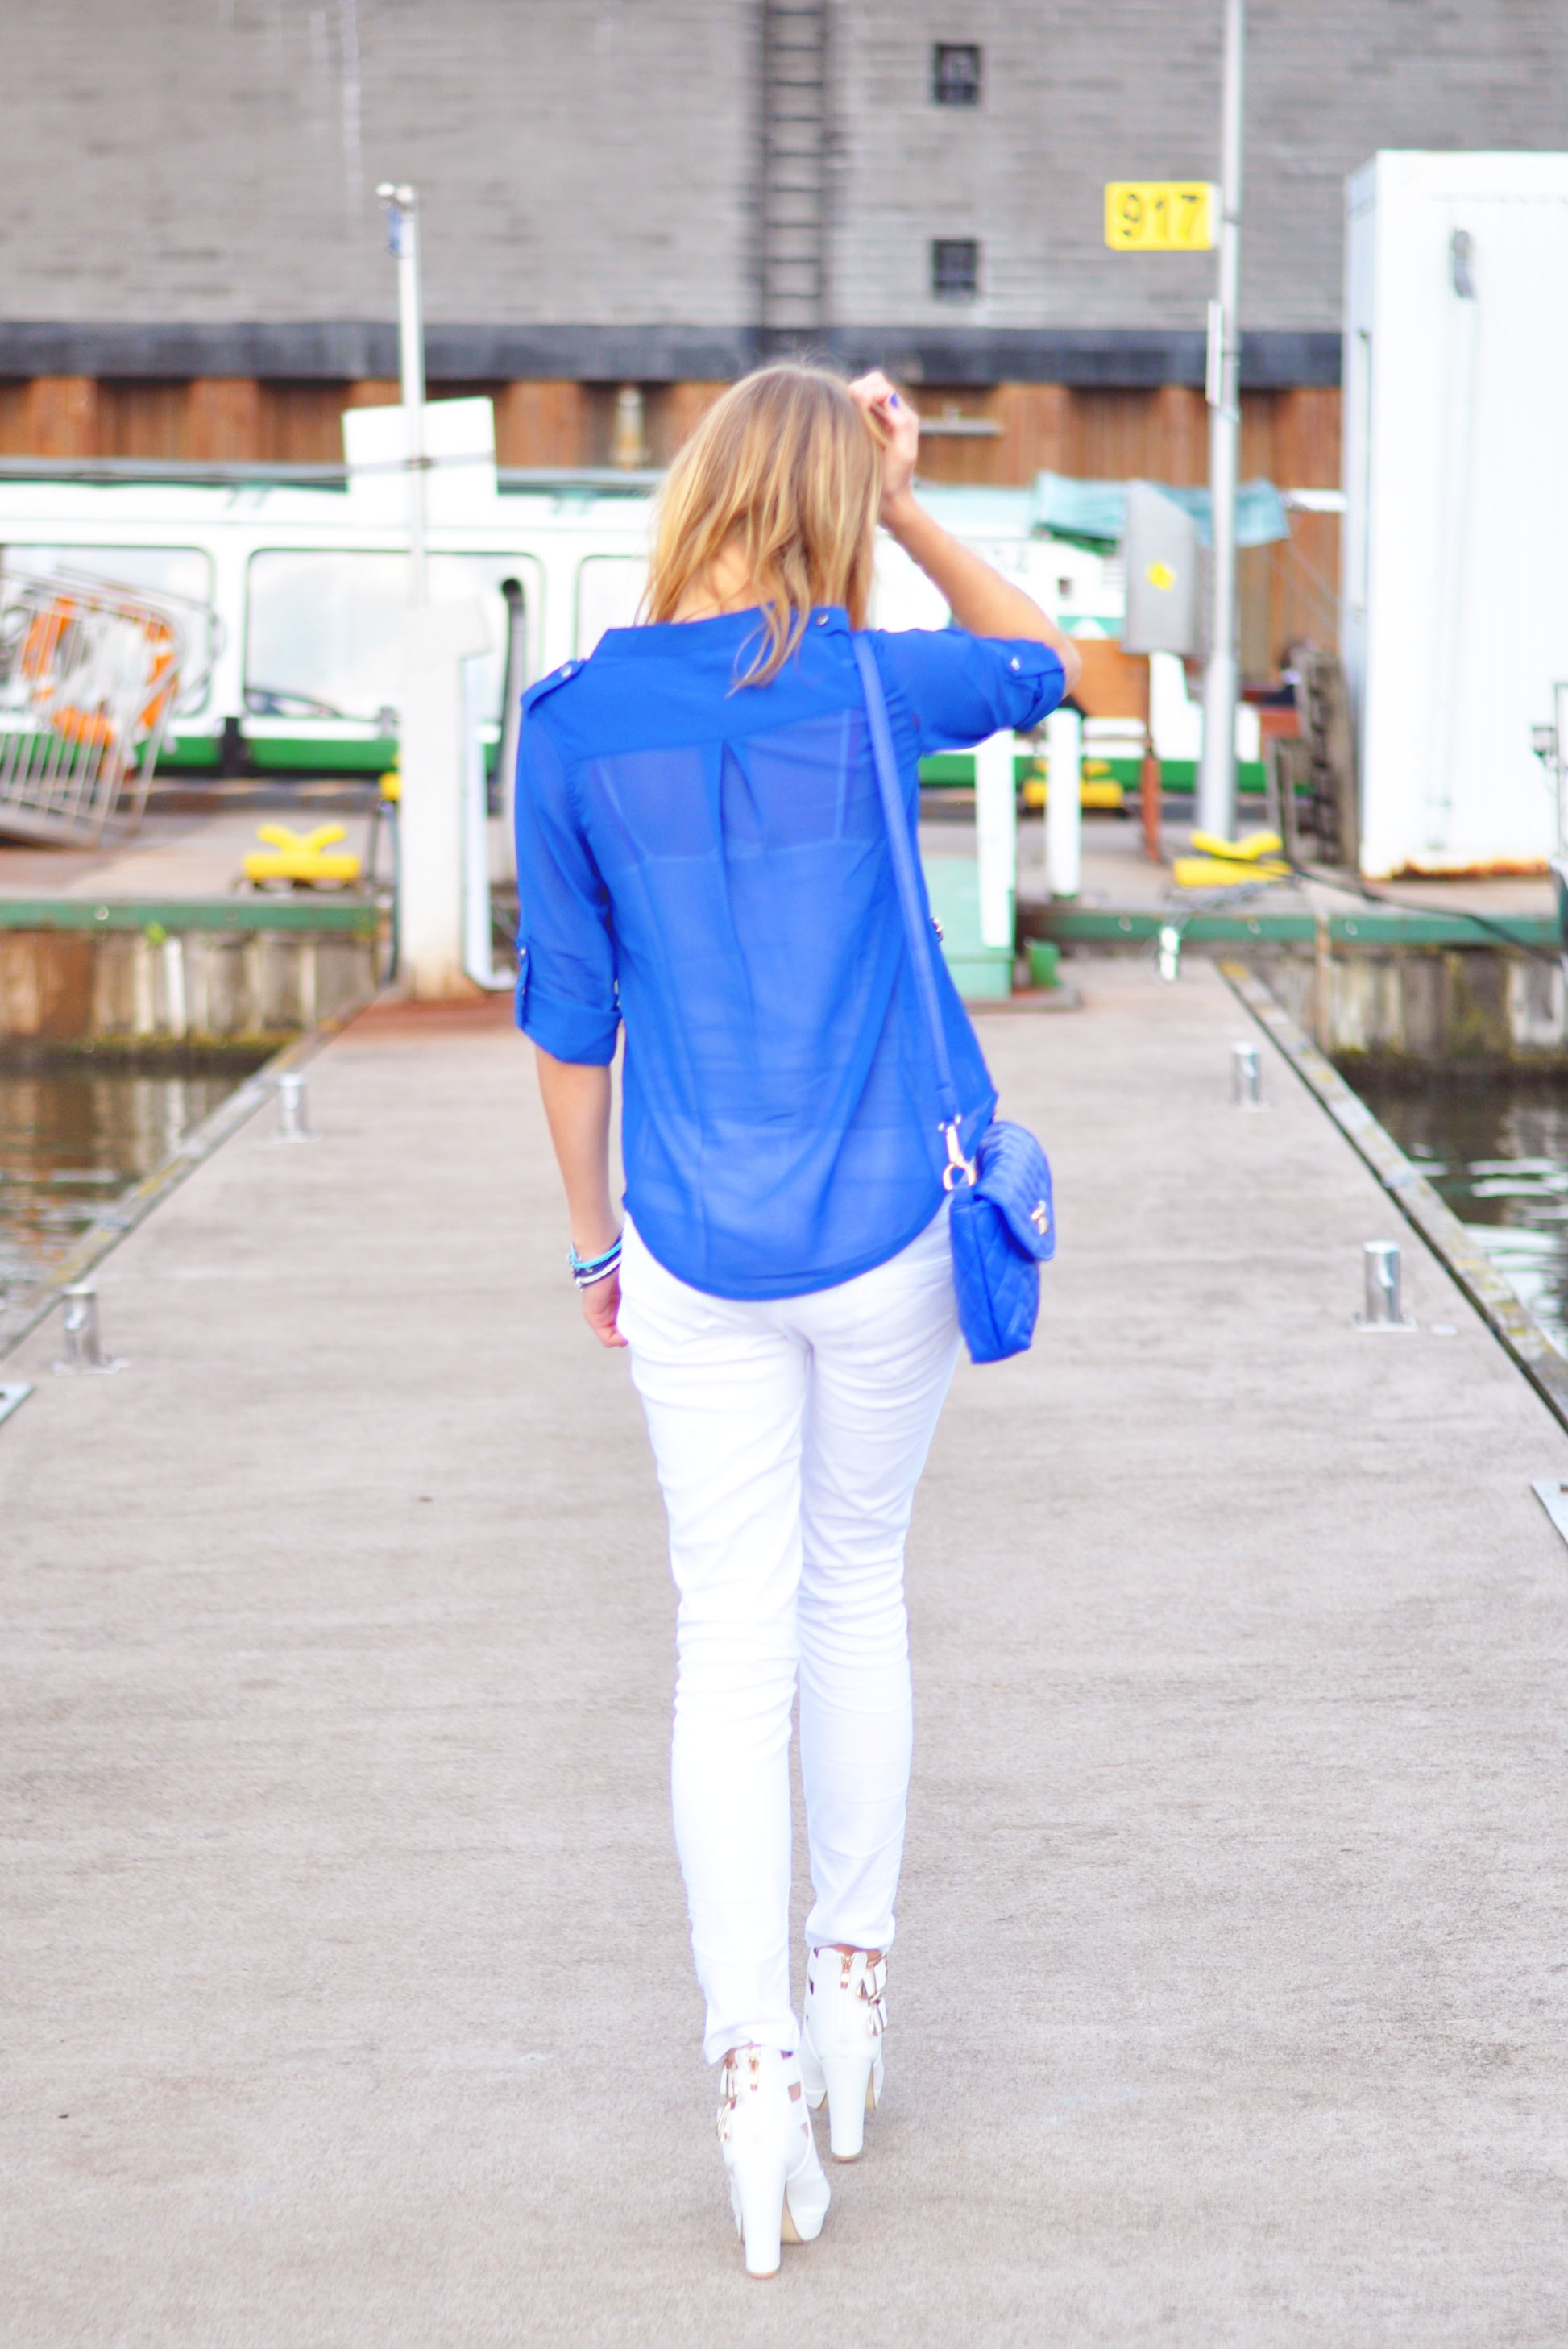 OUTFIT | Blaue Bluse am Hamburger Hafen